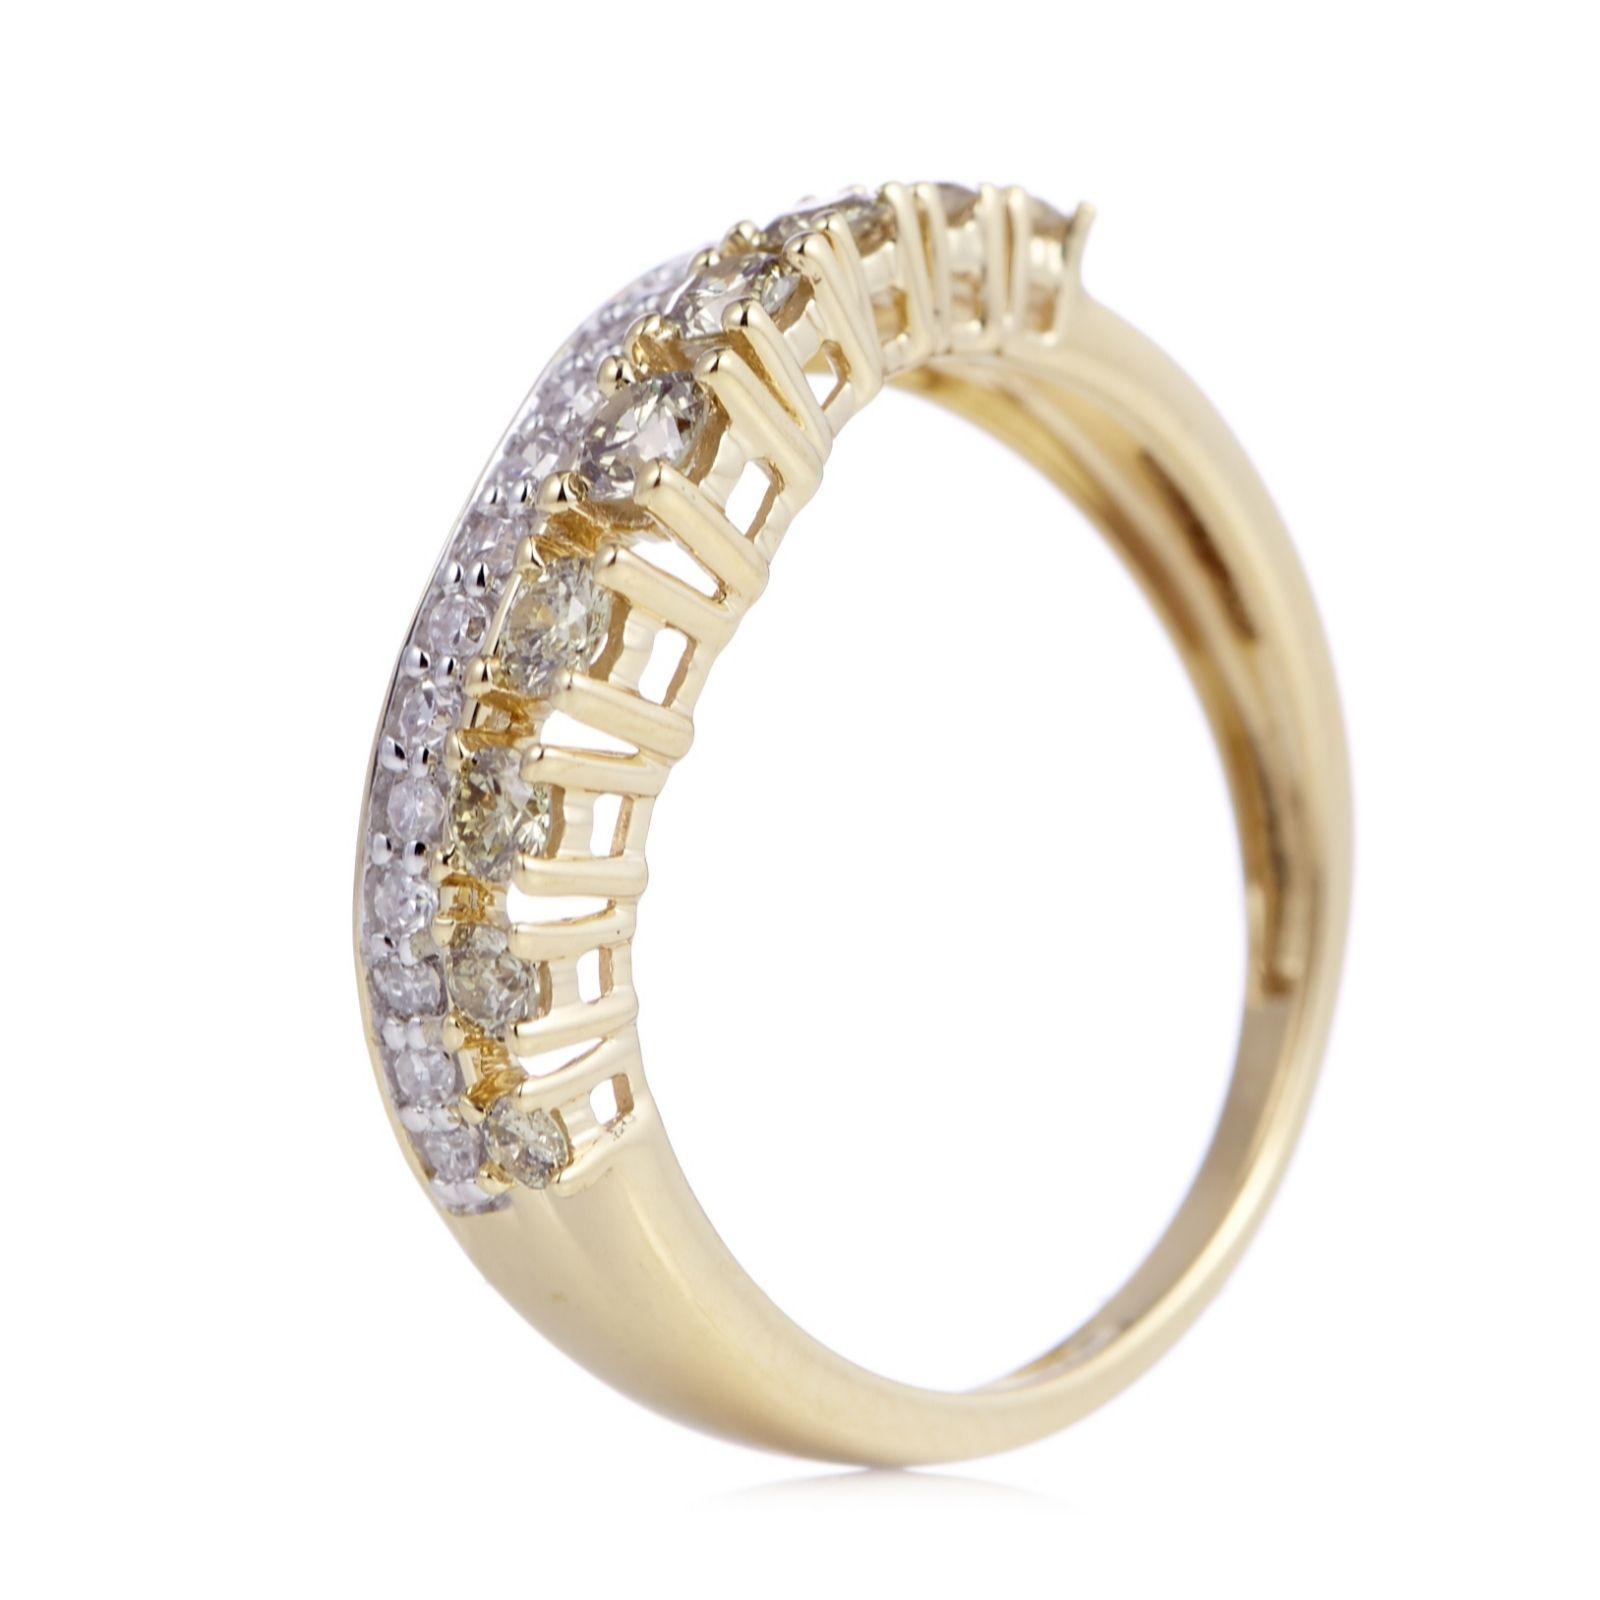 745ab337c89452 0.50ct Coloured Diamond Wishbone Ring 9ct Gold - QVC UK